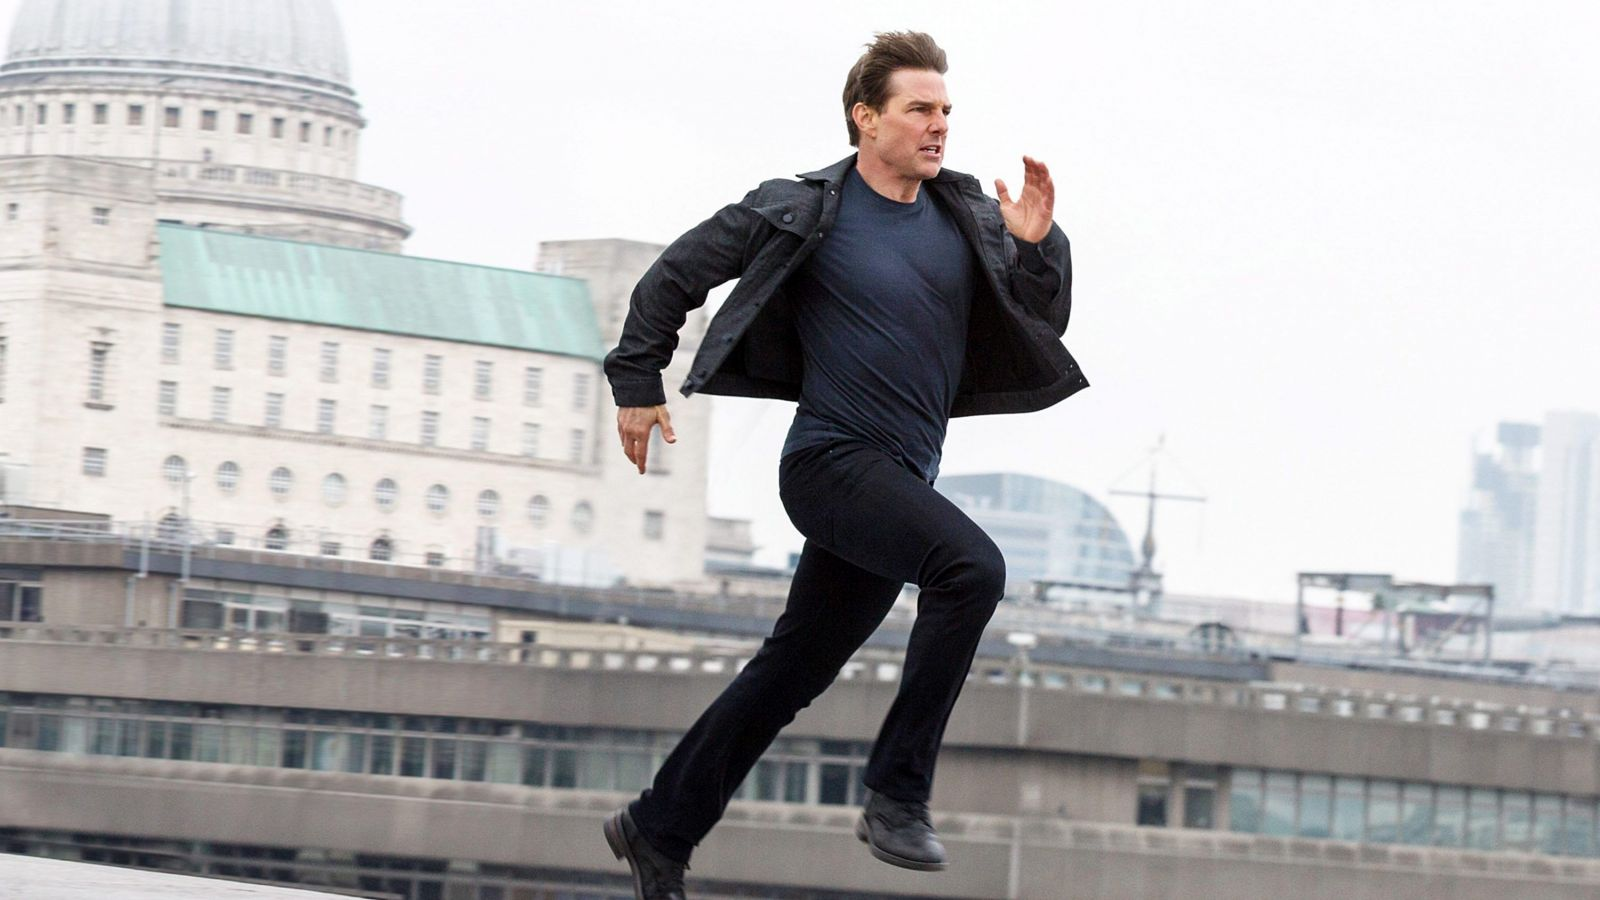 Mission Impossible 7: Η ανατίναξη γέφυρας στην Πολωνία, μέρος του σεναρίου, προκαλεί αντιδράσεις [pics&vid]